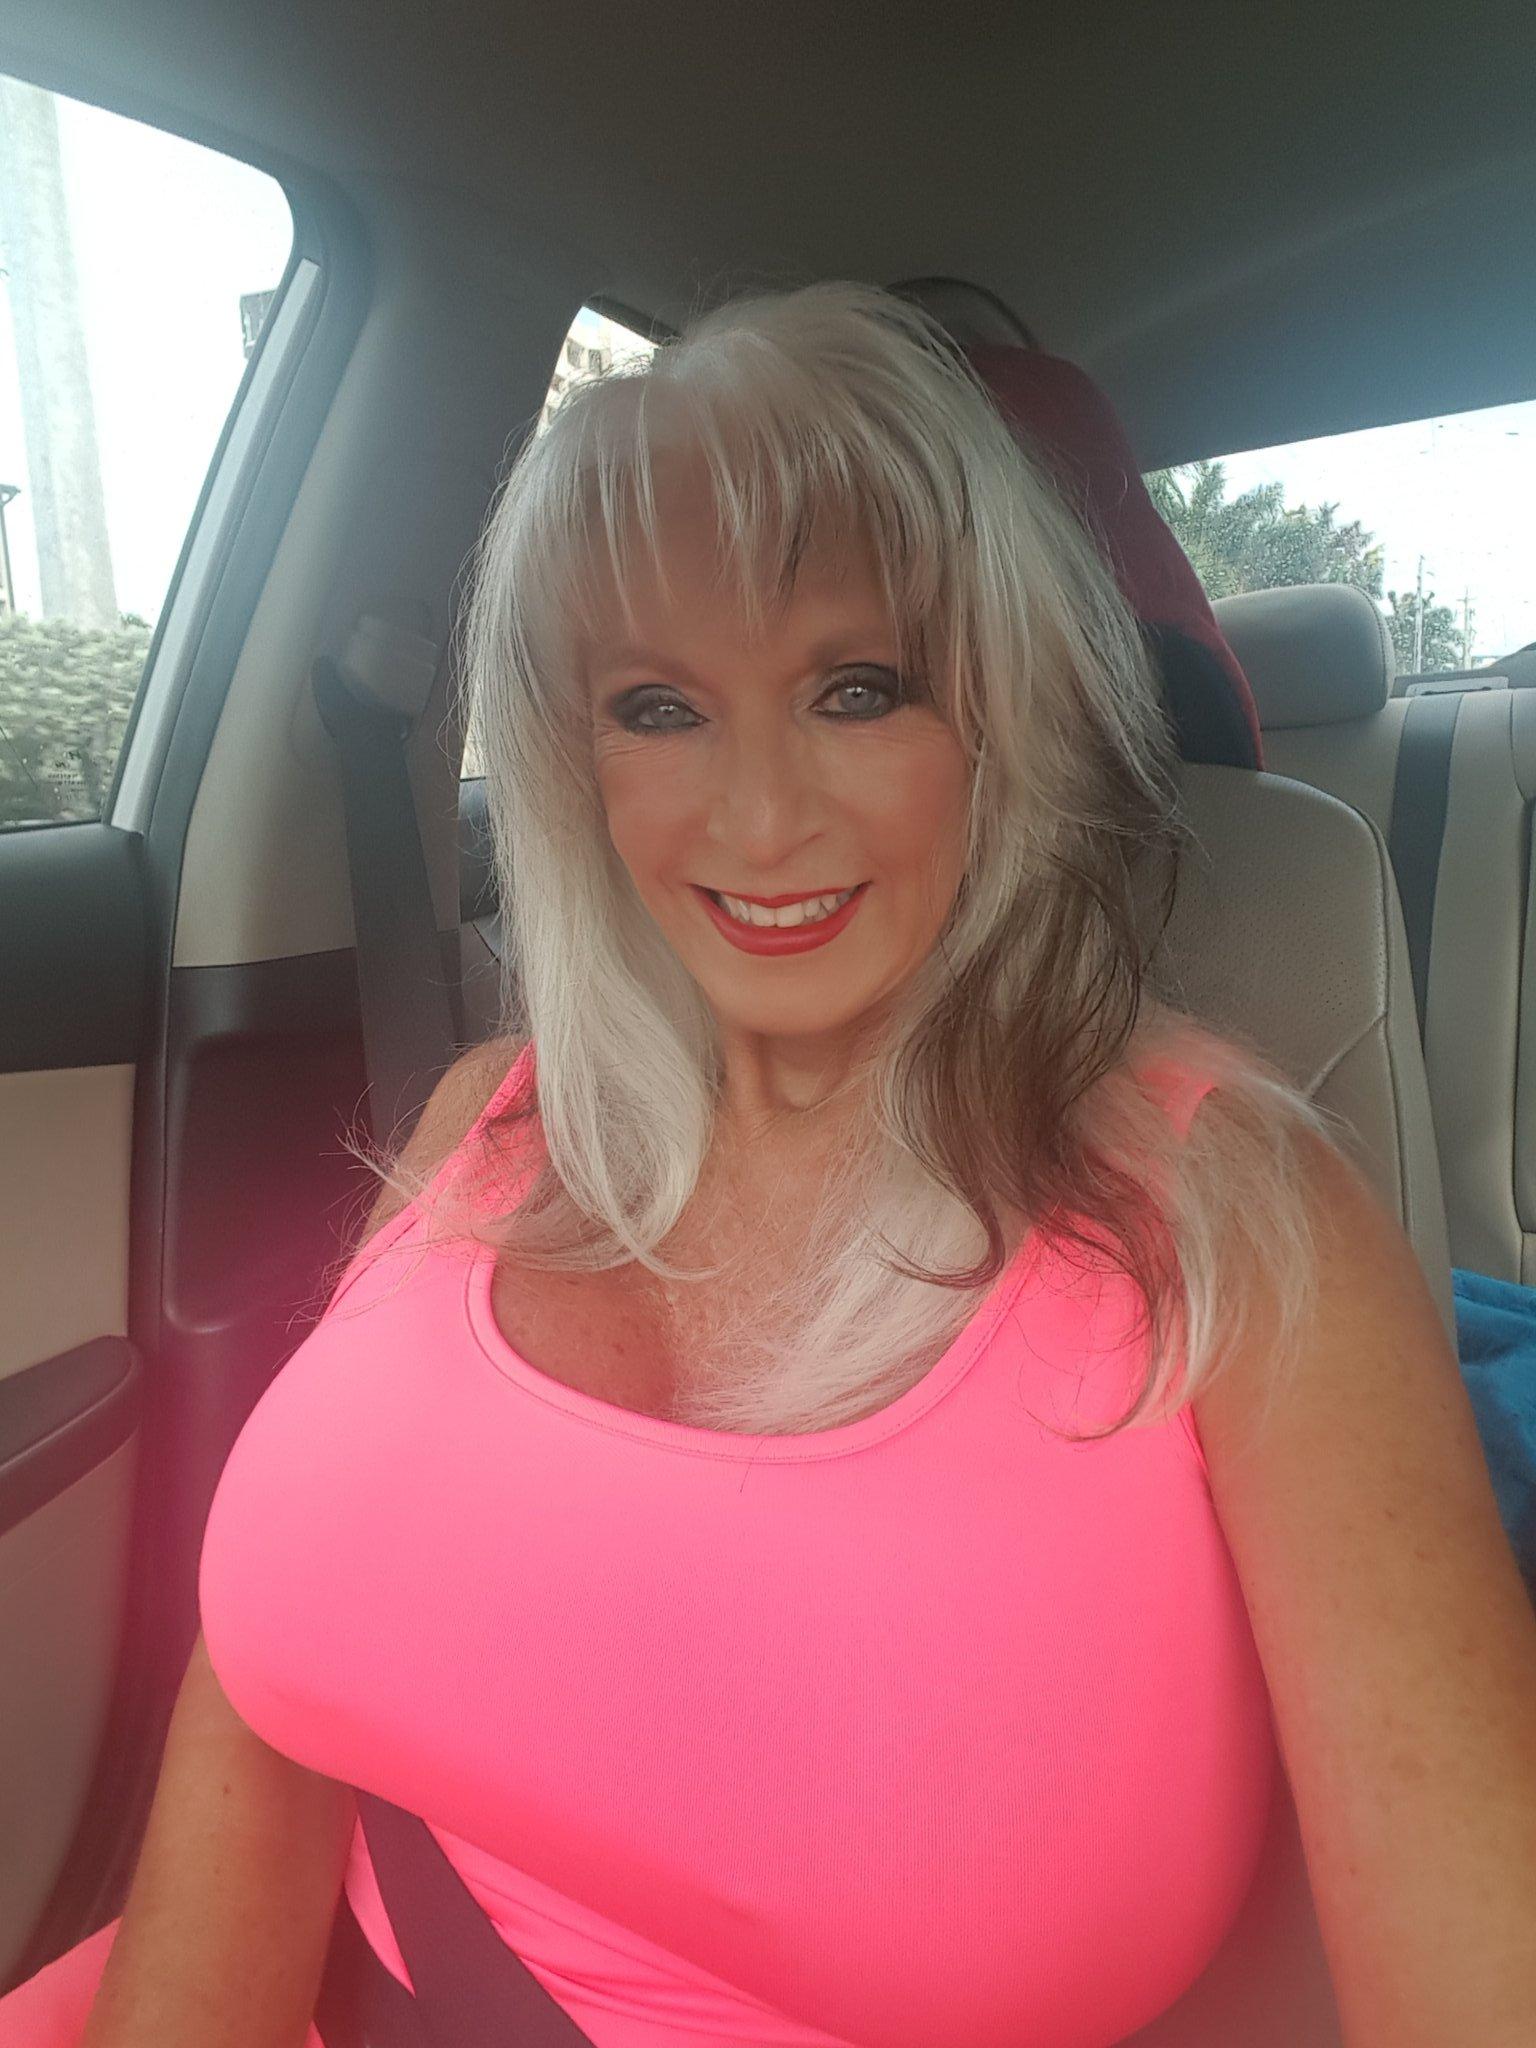 TW Pornstars - Sally DAngelo. Twitter. Happy Sunday yall